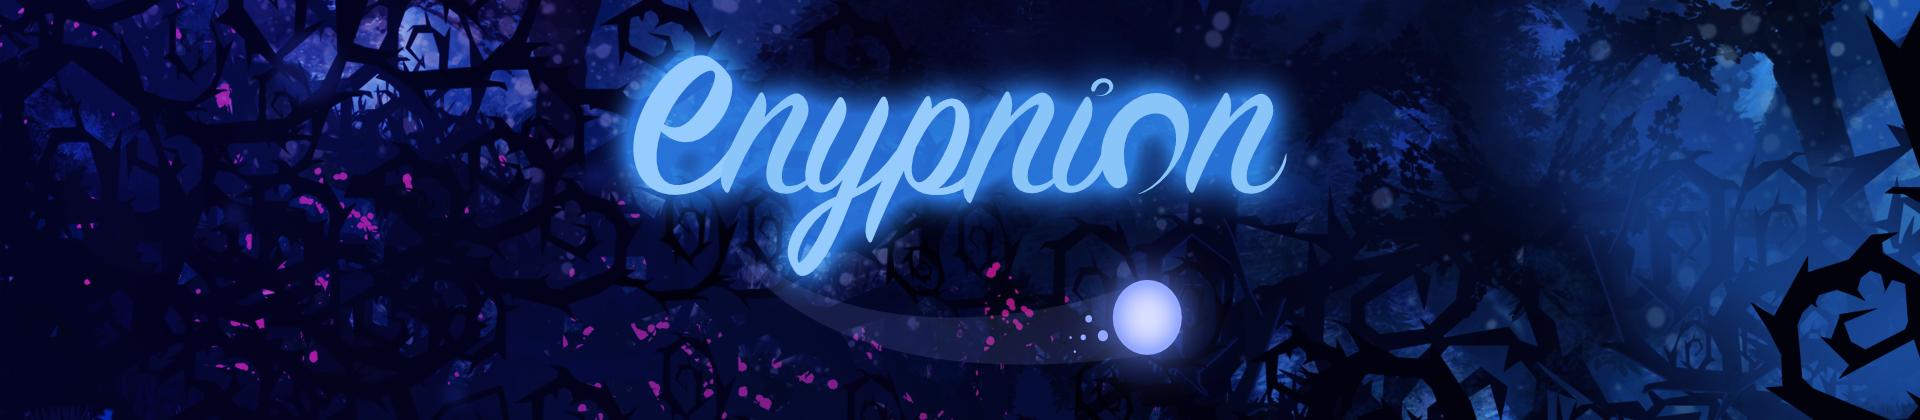 Enypnion